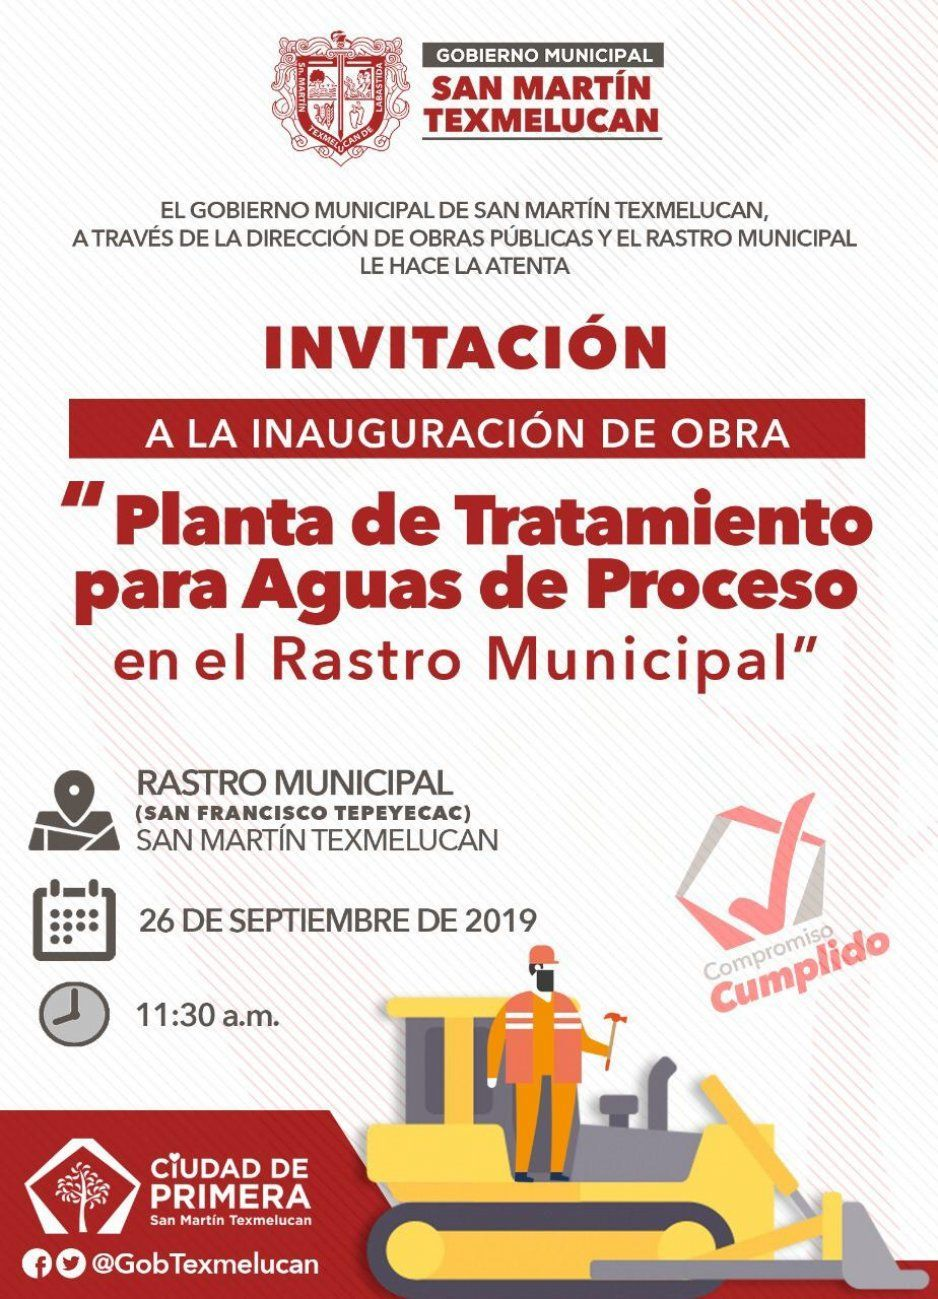 Texmelucan invitan a inauguración de planta de tratamiento para aguas de rastro municipal (VIDEO)